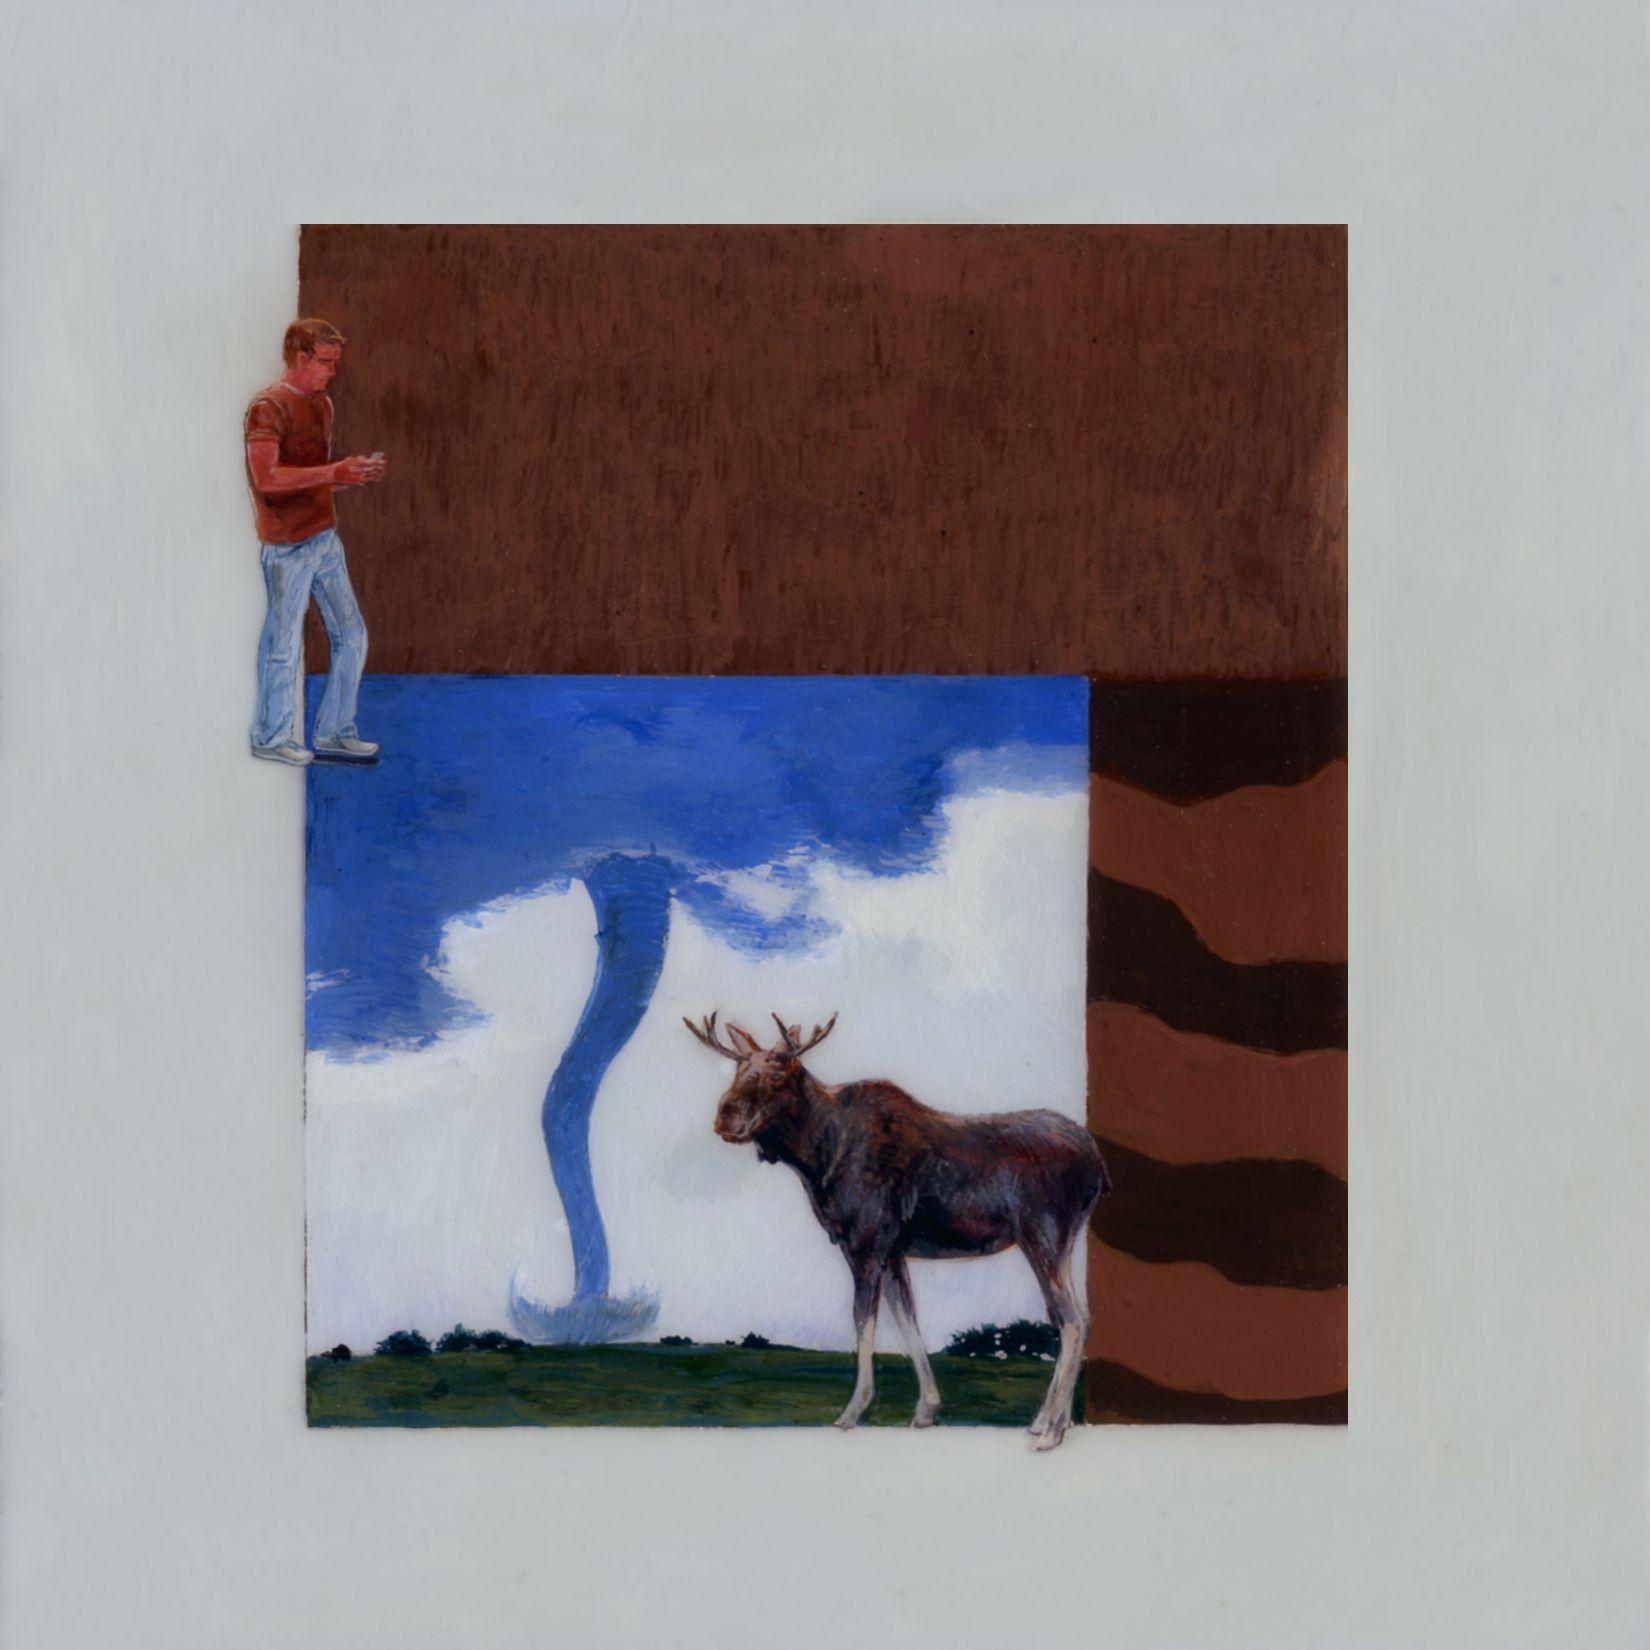 ADAM MYSOCK Davie Crockett, Pecos Bill, the Bull Moose Party, and a